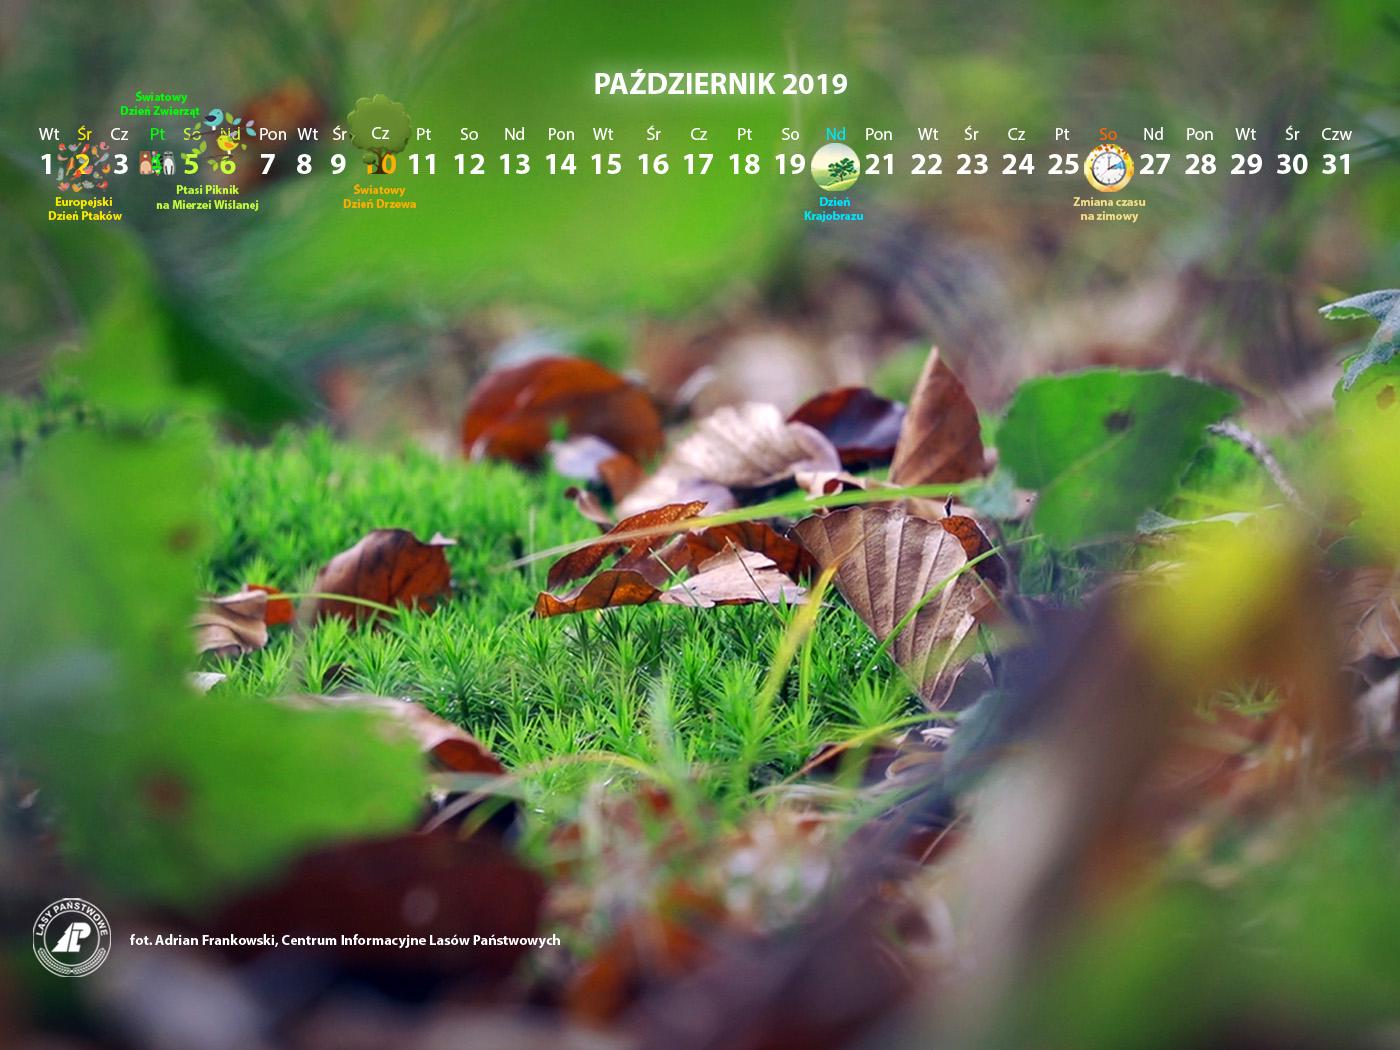 Kalendarz_październik_2019_1400x1050[1].jpg